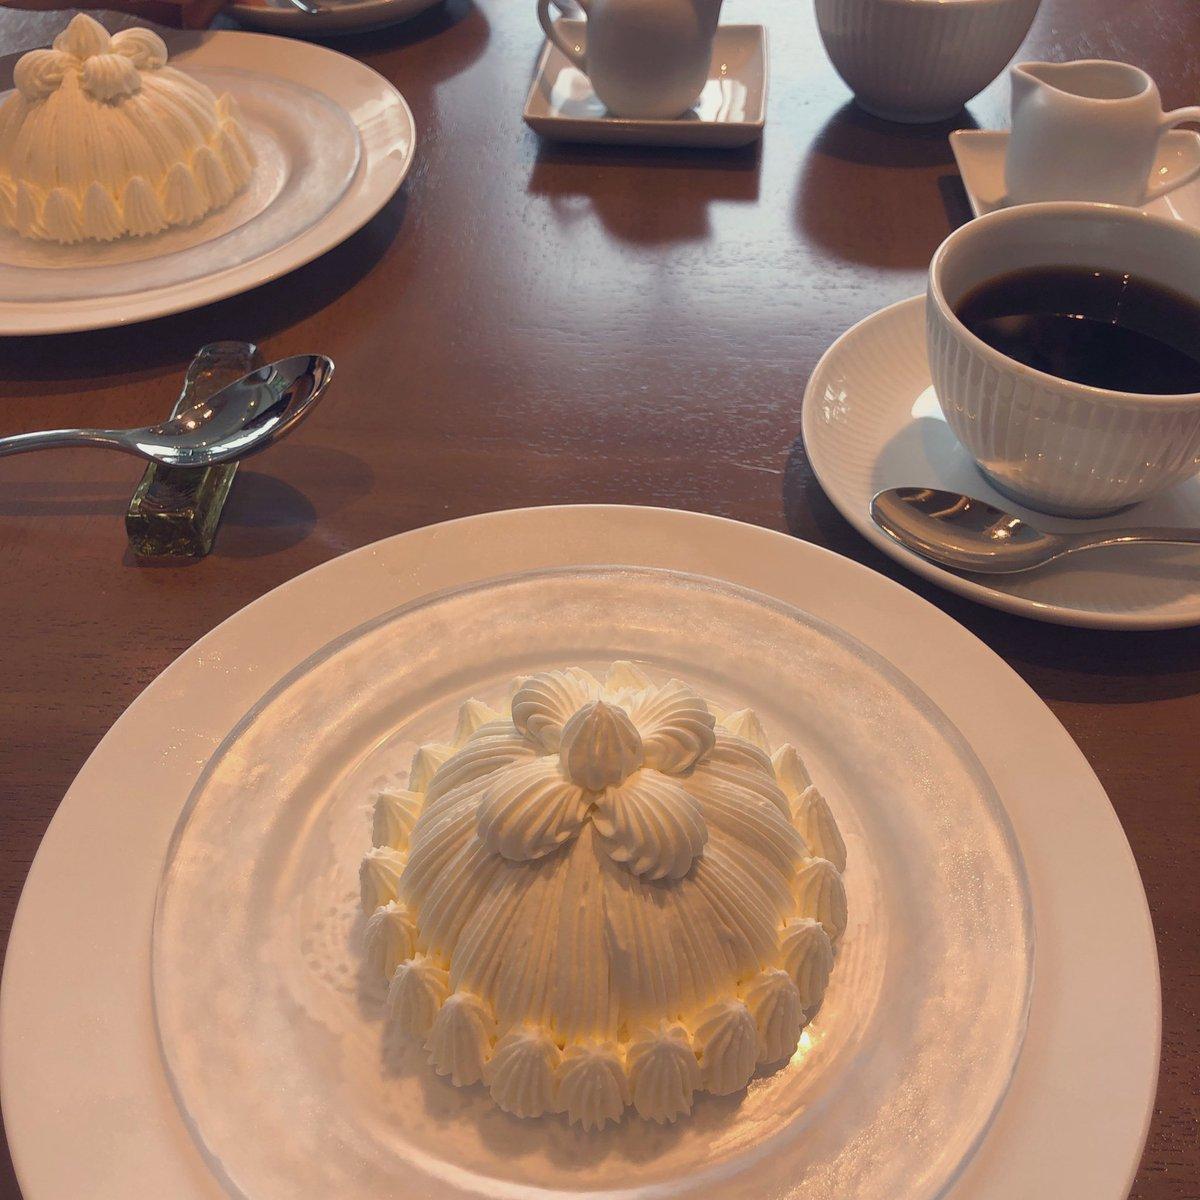 test ツイッターメディア - マロンシャンテリーが美味しすぎたっ💕 #東京會舘 #マロンシャンテリー https://t.co/yn1TnTFoKm